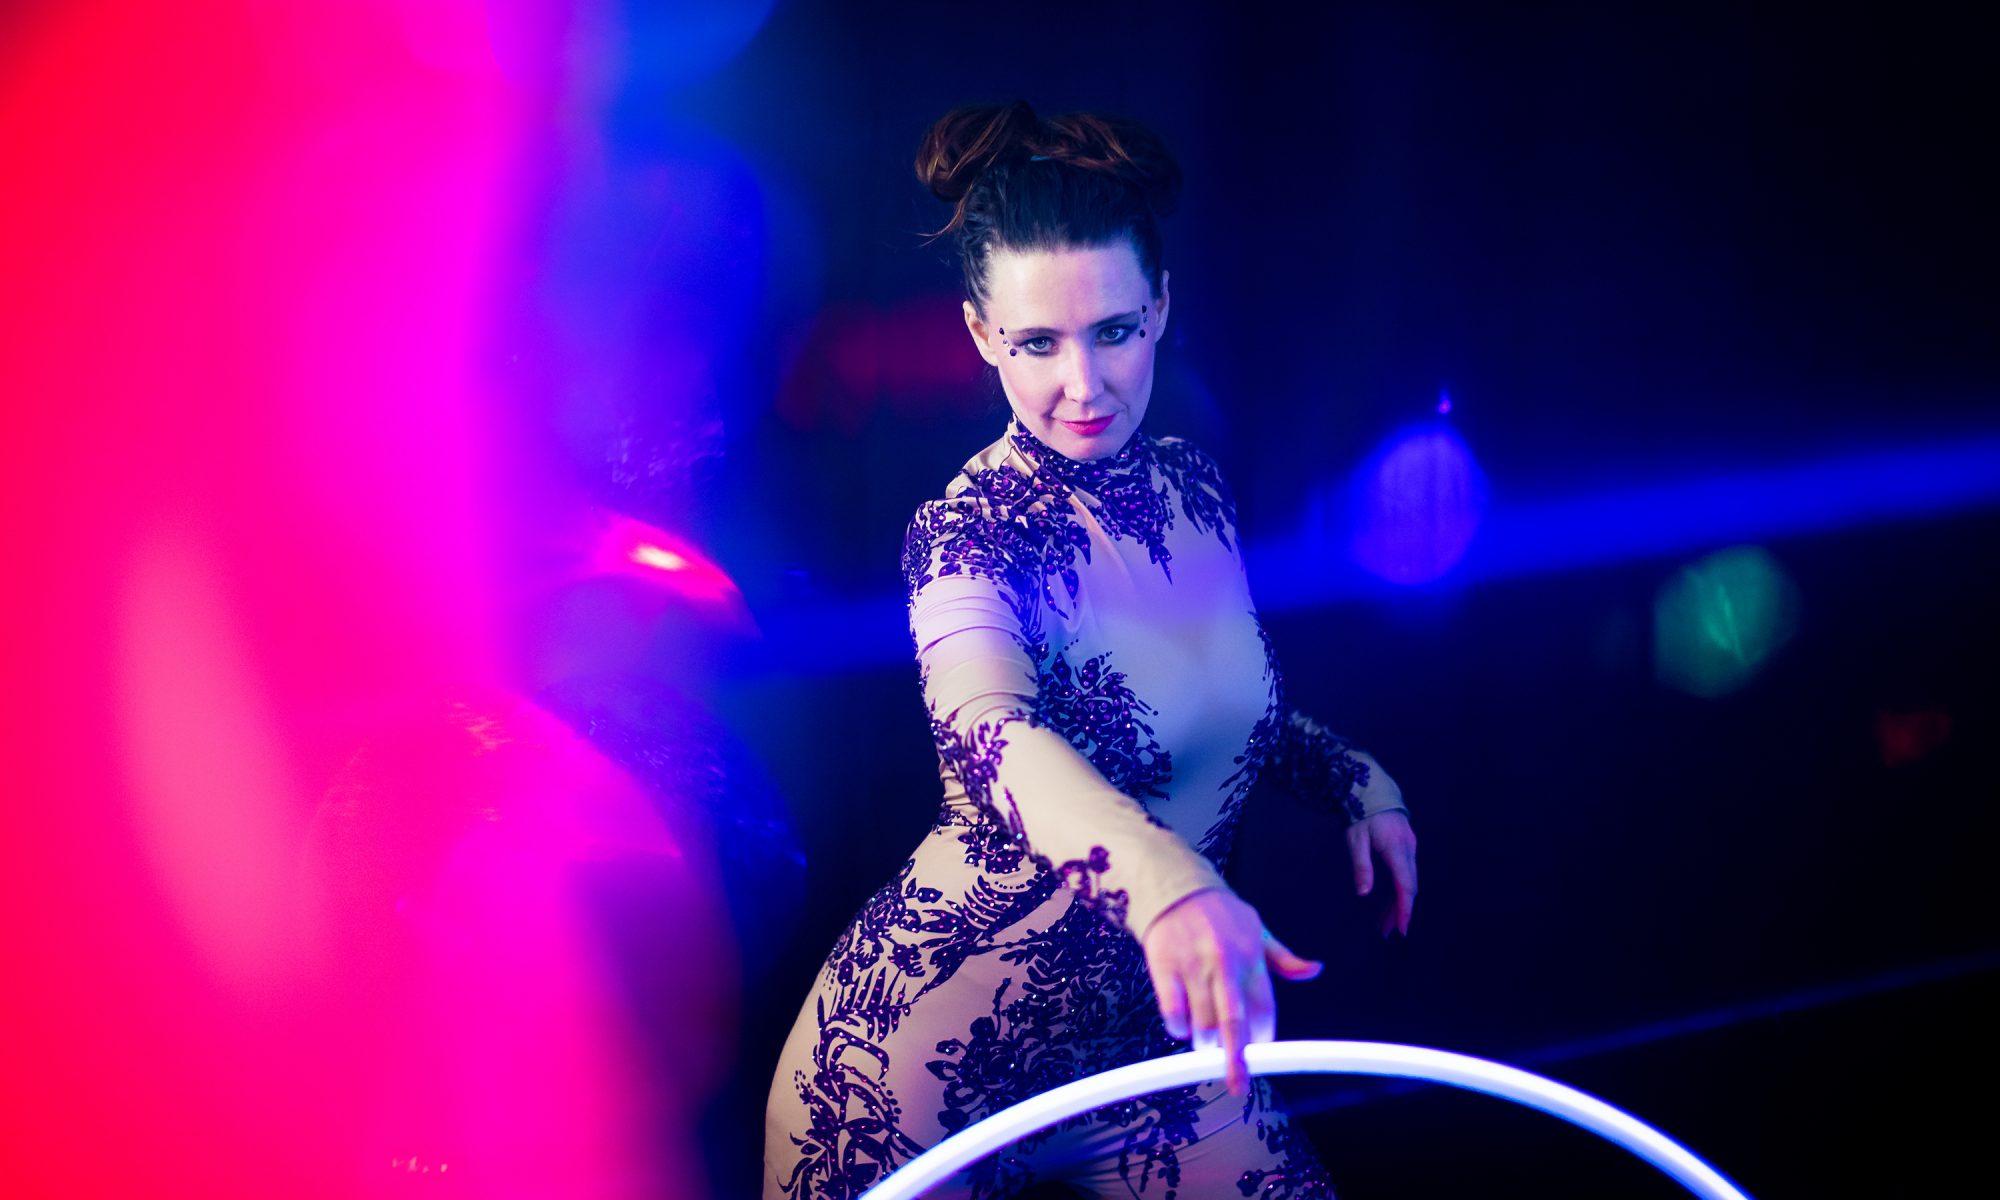 LED glow dancer Lucy Loop